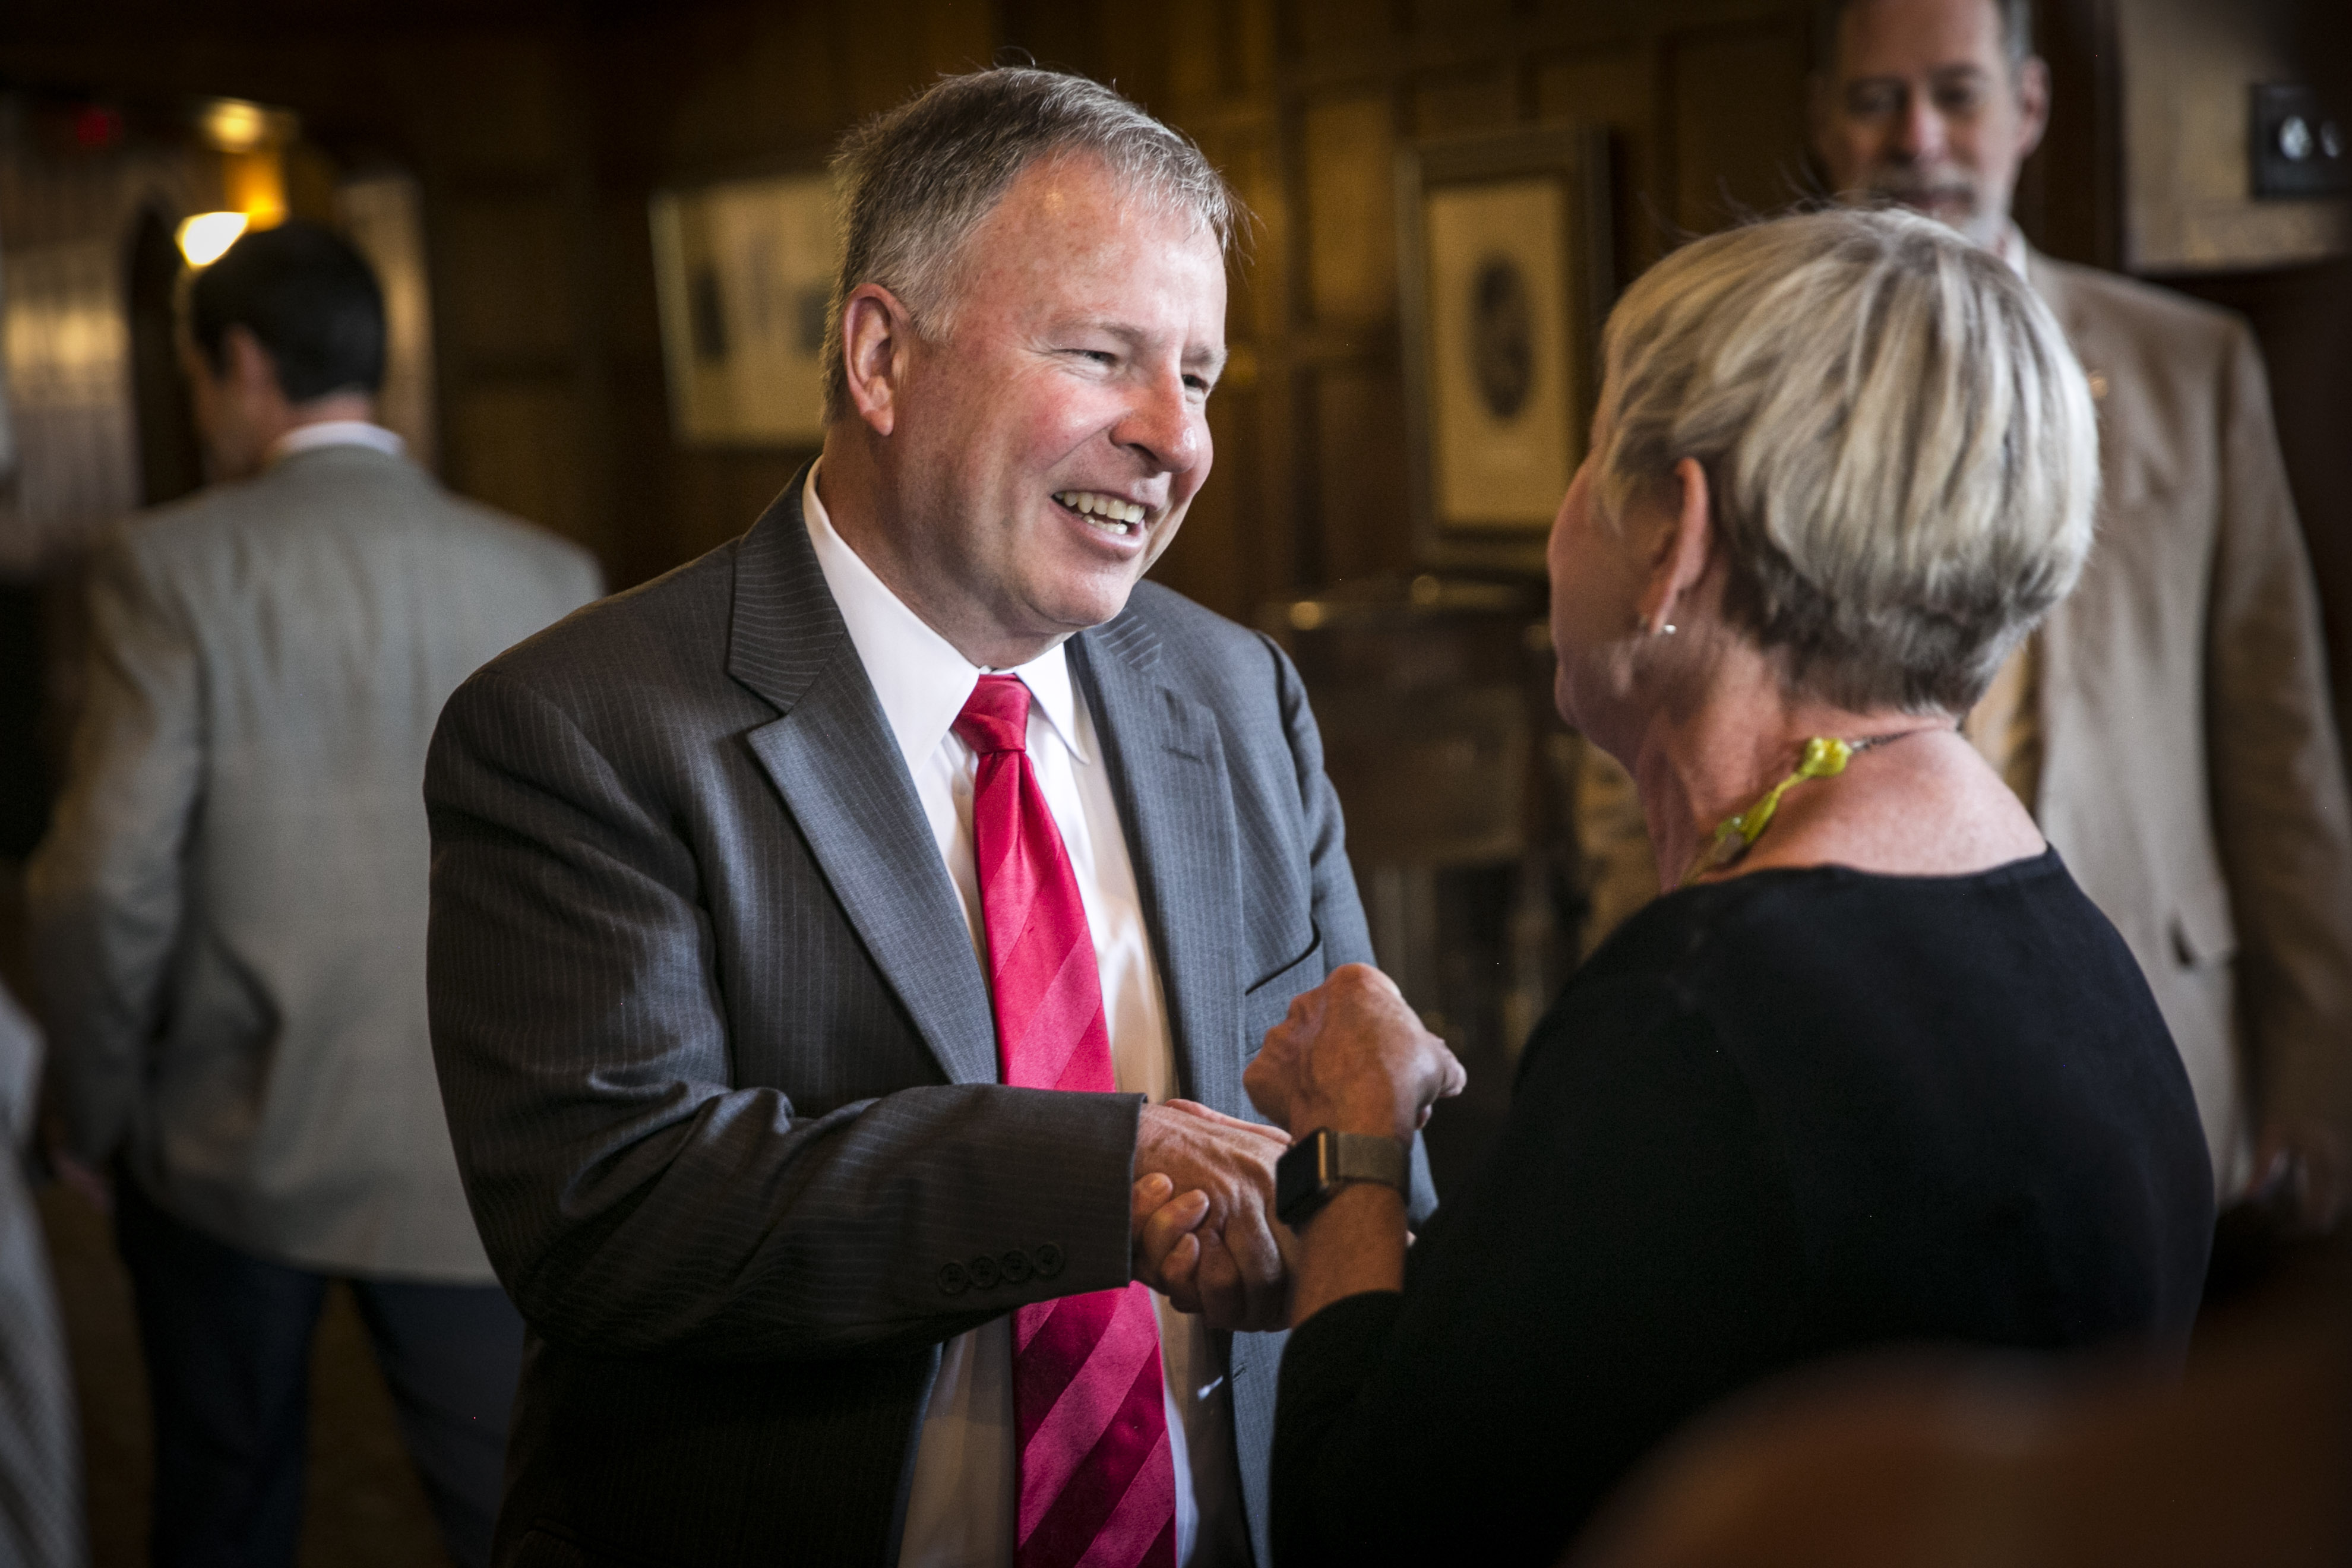 <p>U.S.Rep. Doug Lamborn greets a supporter atGlen Eyrie in Colorado Springs on Monday, June 11, 2018.</p>